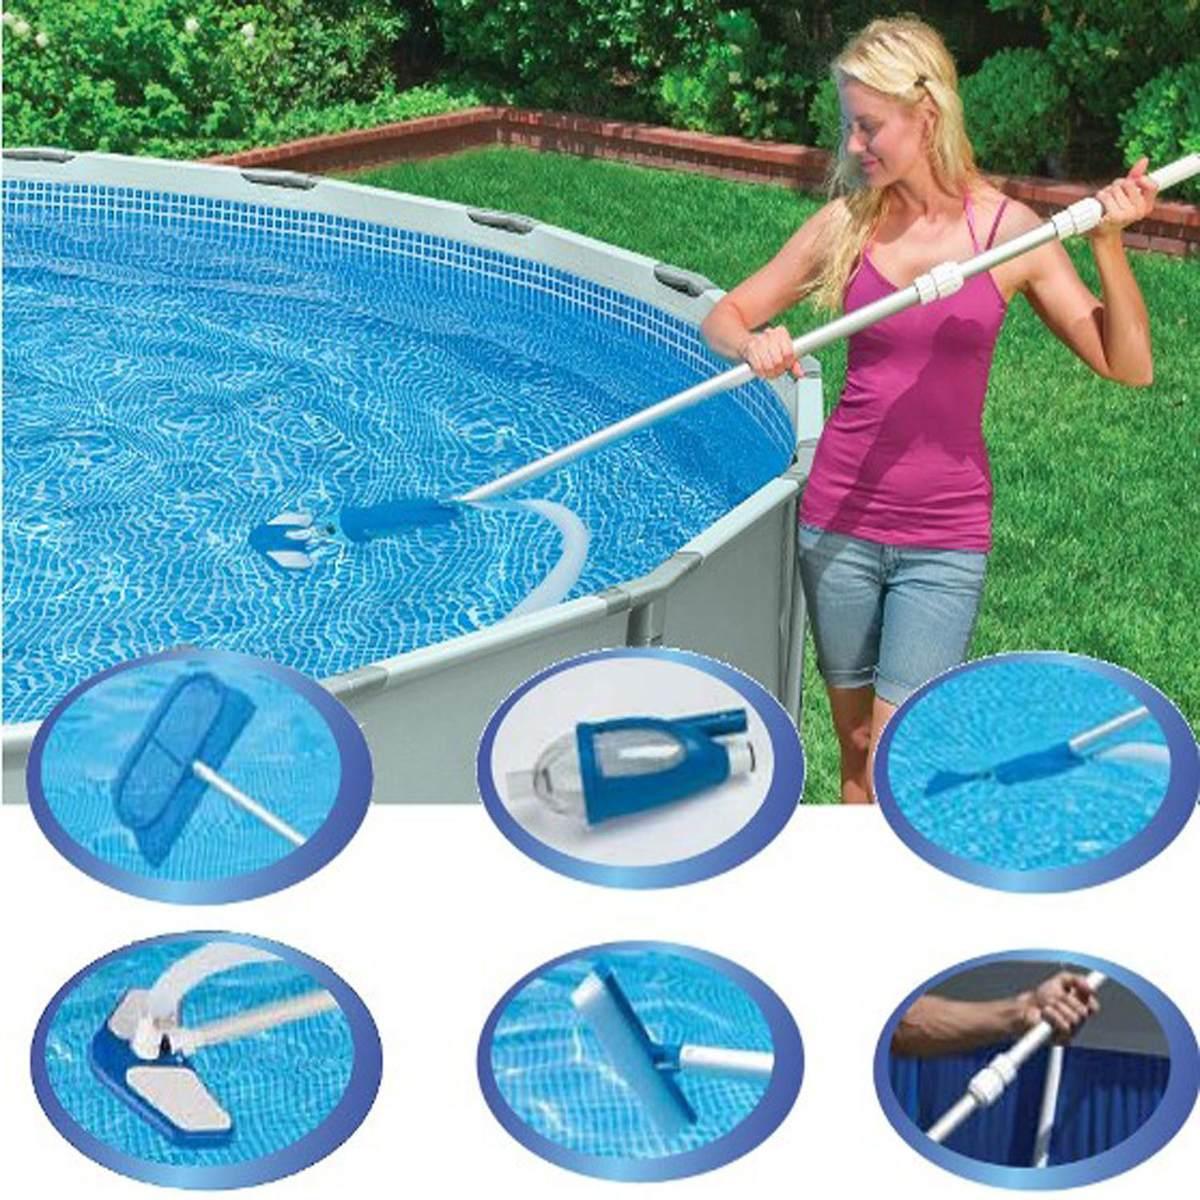 Kit De Limpeza Piscina Deluxe Aspirador Escova Vacuum Intex